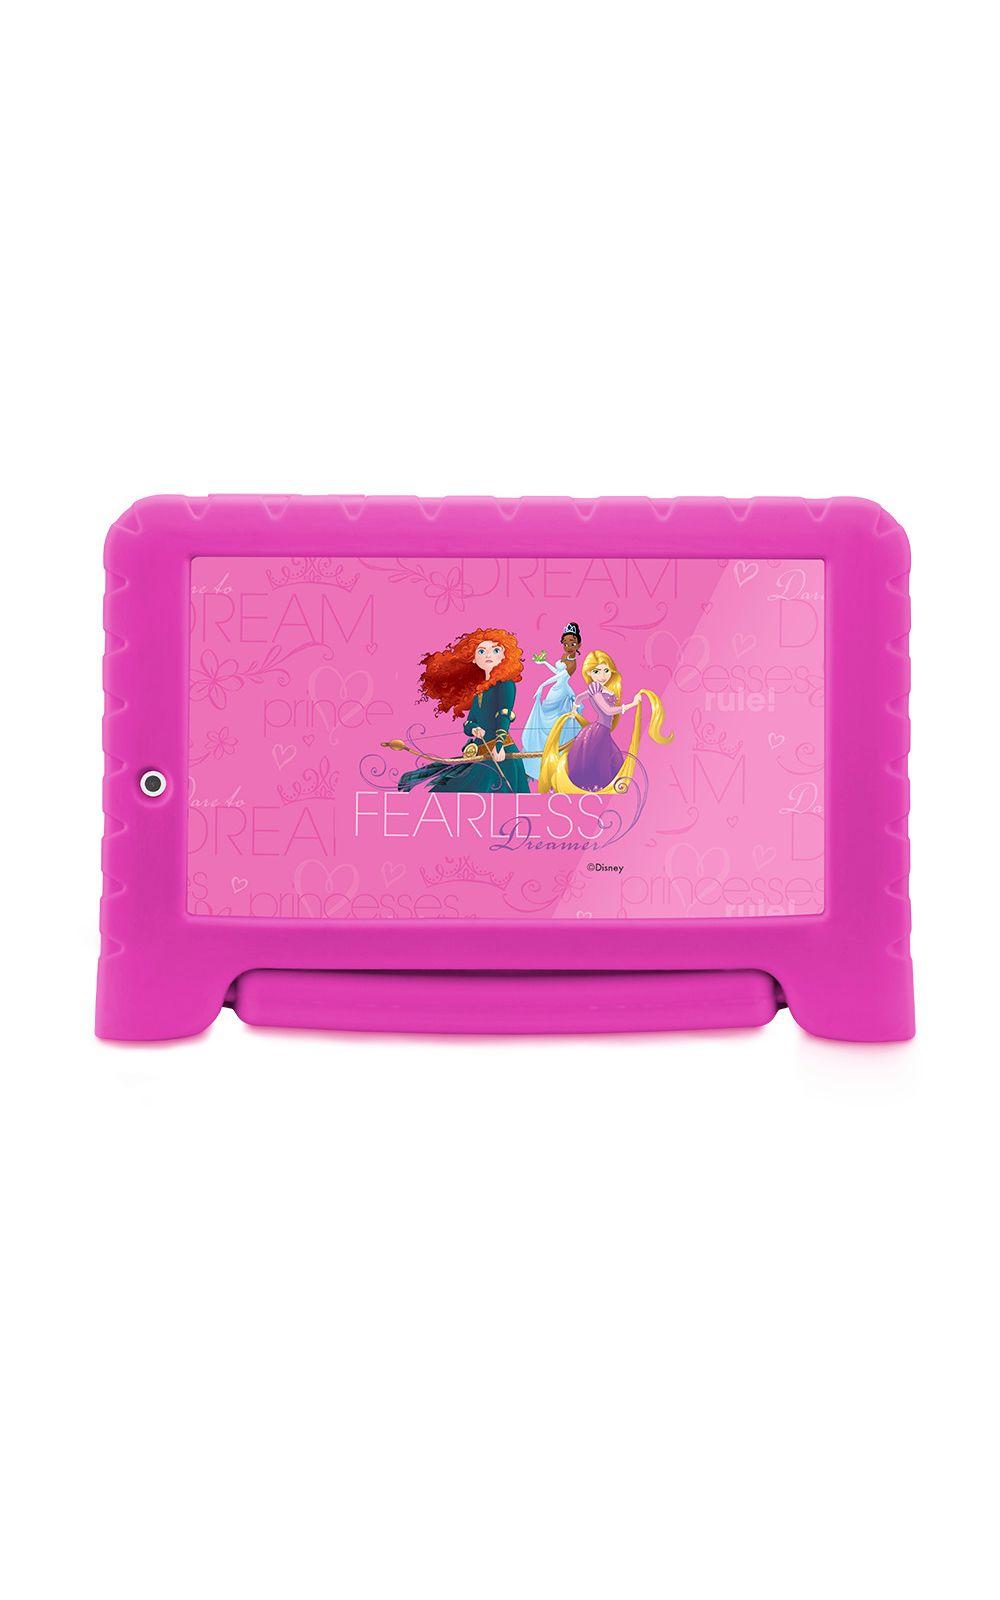 Foto 1 - Tablet Multilaser Disney Princesas Plus 16GB Tela 7 Pol. Quad Core Dual Câmera Rosa- NB308